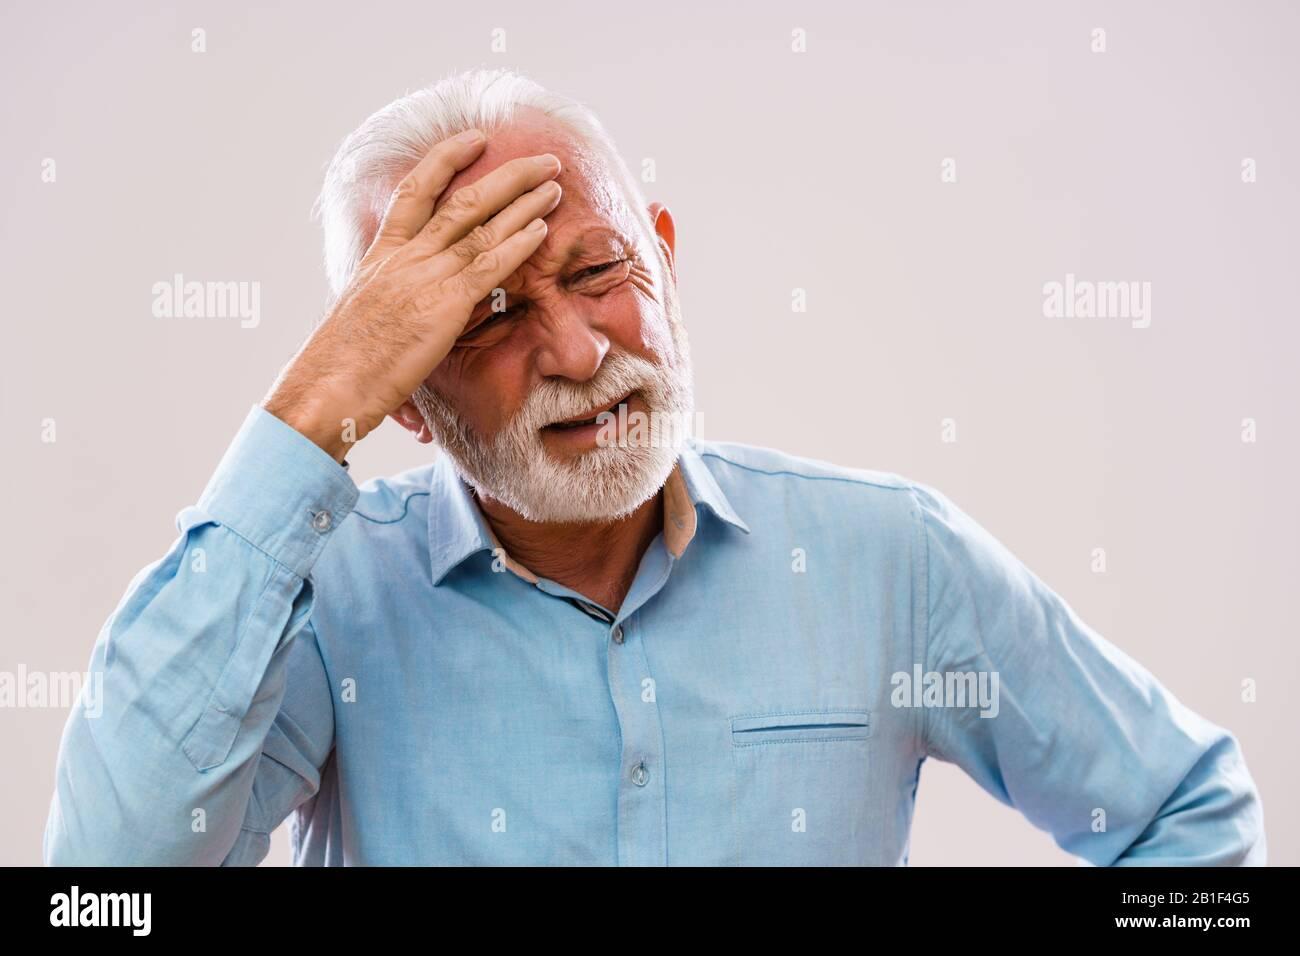 Portrait of senior man who is having headache. Stock Photo